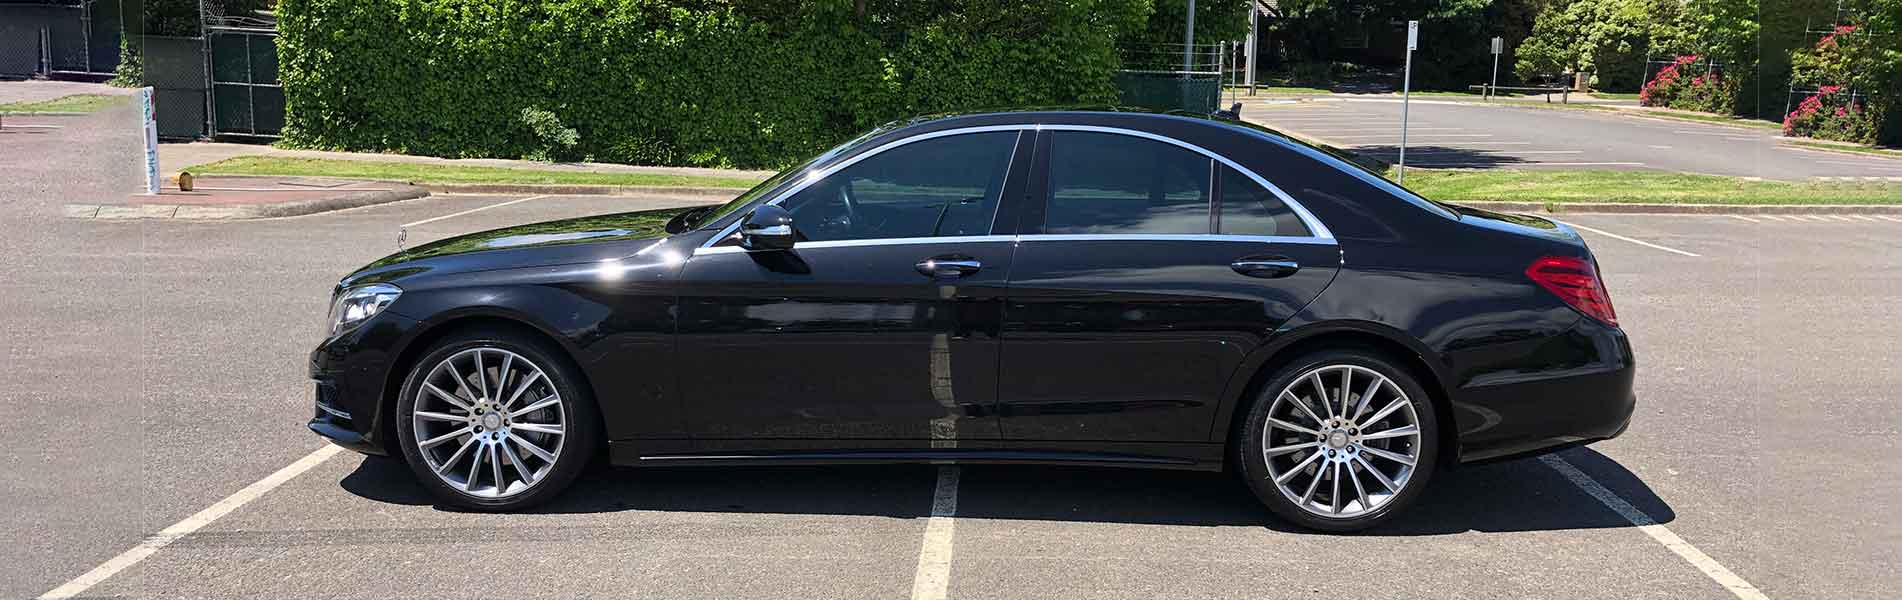 Mercedes S Class Left Engle